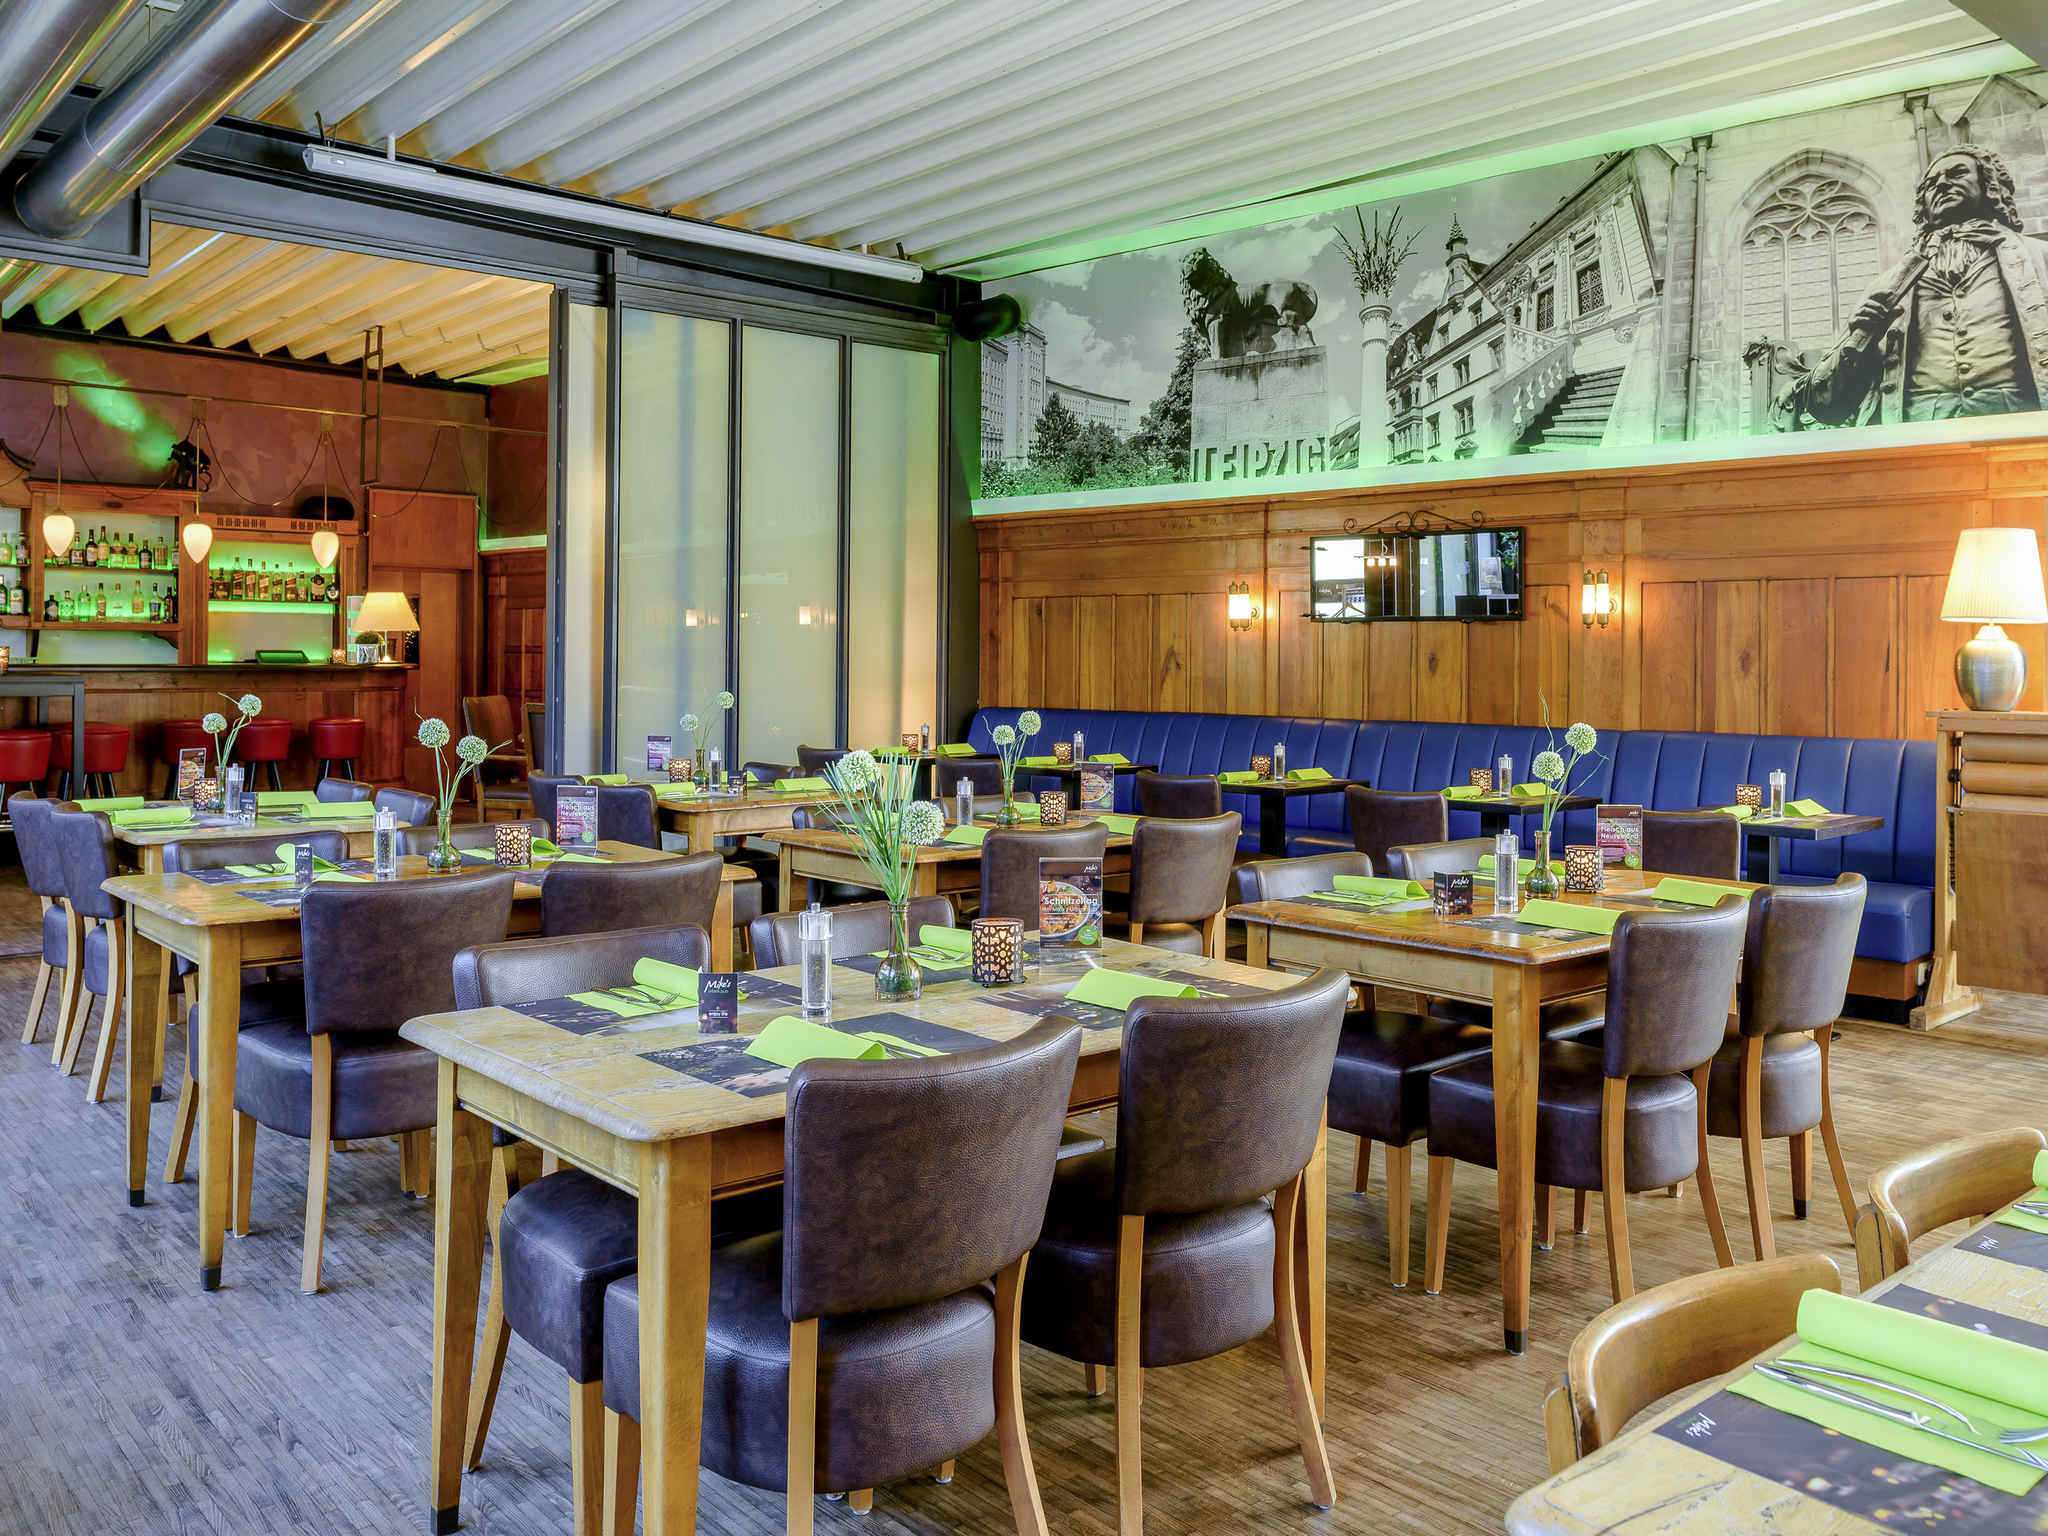 Gaststtte sthle trendy pool bar and restaurant cocktails for Pool garden leipzig